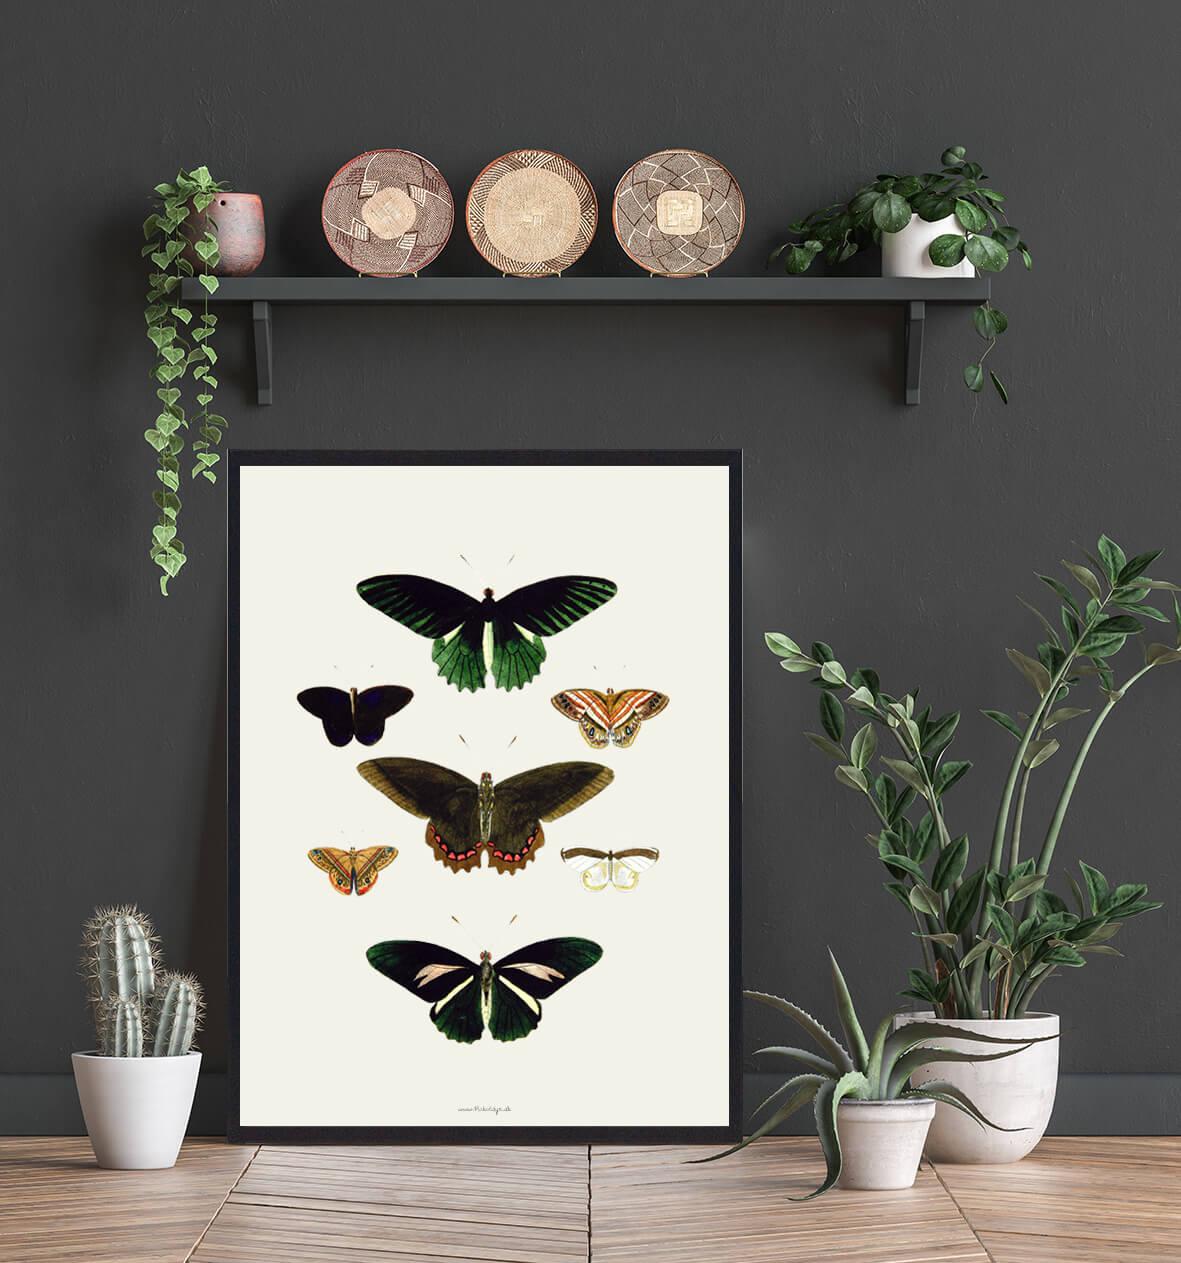 sommerfugle-plakat-boligindretning-3